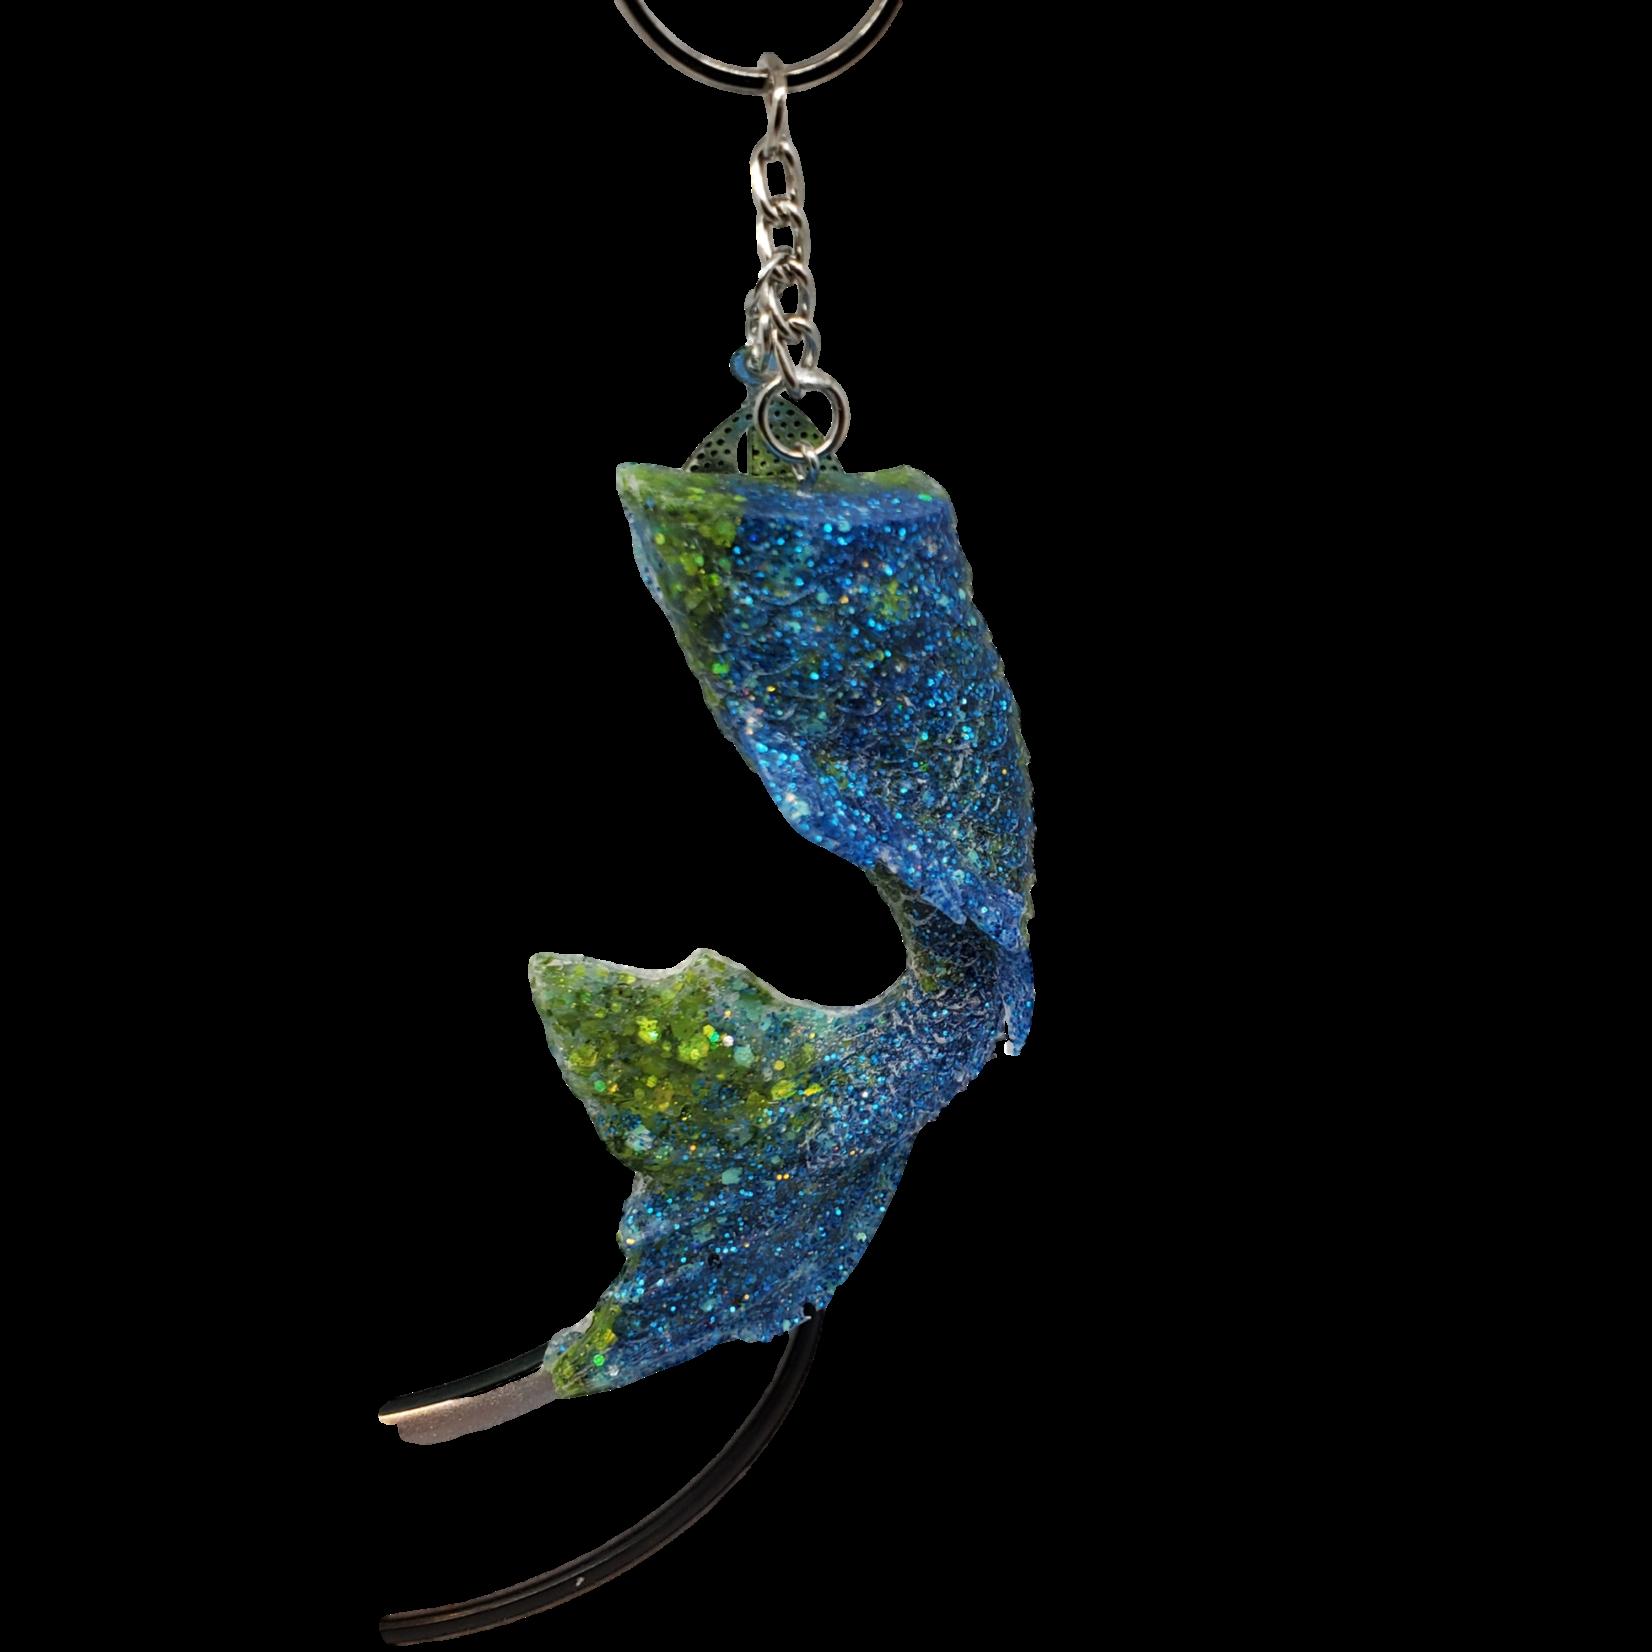 East Coast Sirens Large Blue & Green Glitter - Mermaid Curved Tail Key Chain